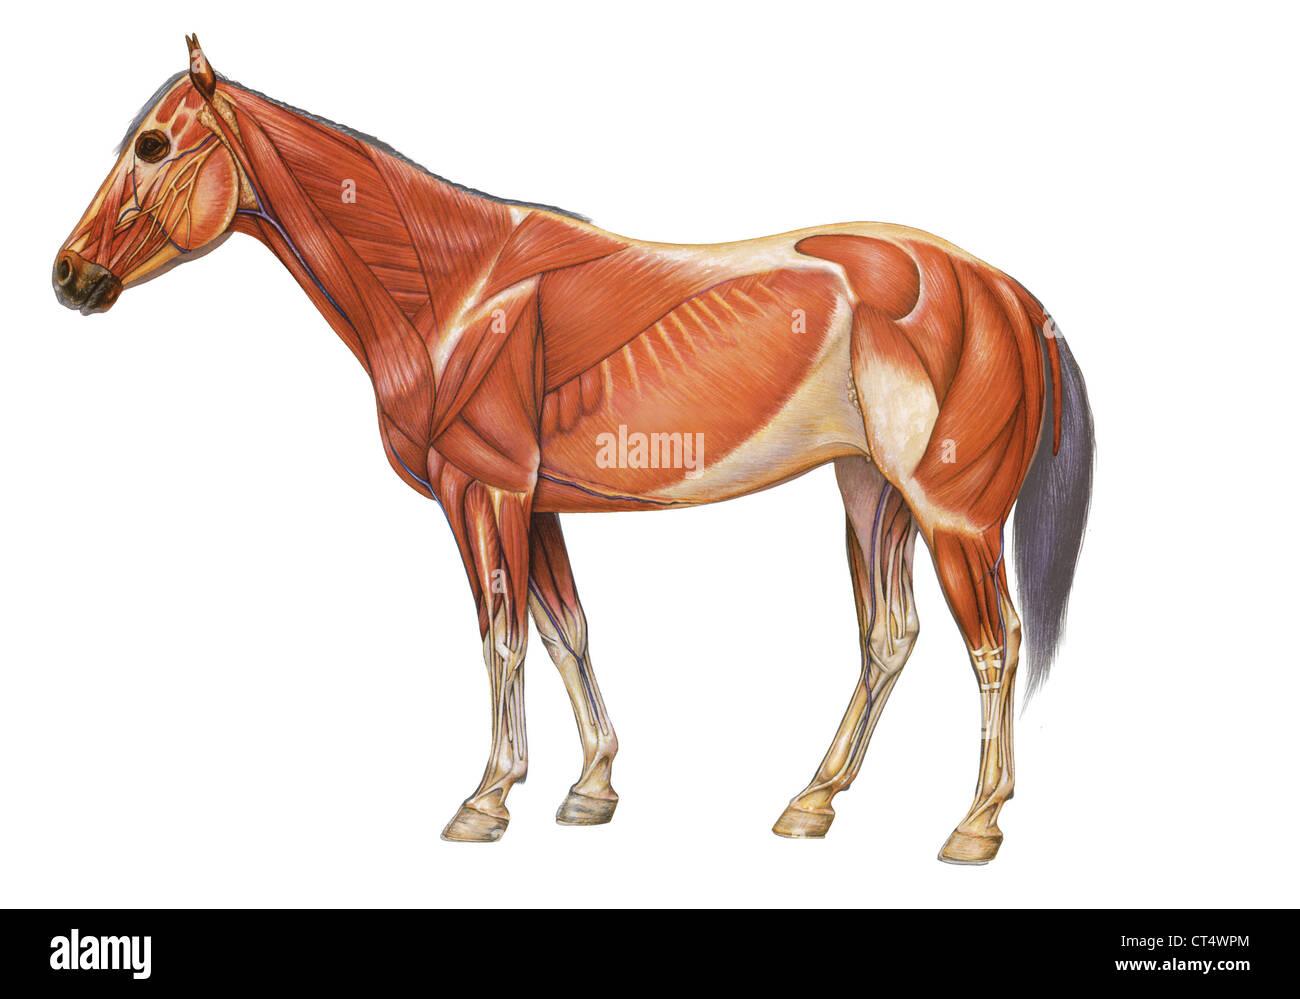 Anatomía del caballo, dibujo Foto & Imagen De Stock: 49280524 - Alamy